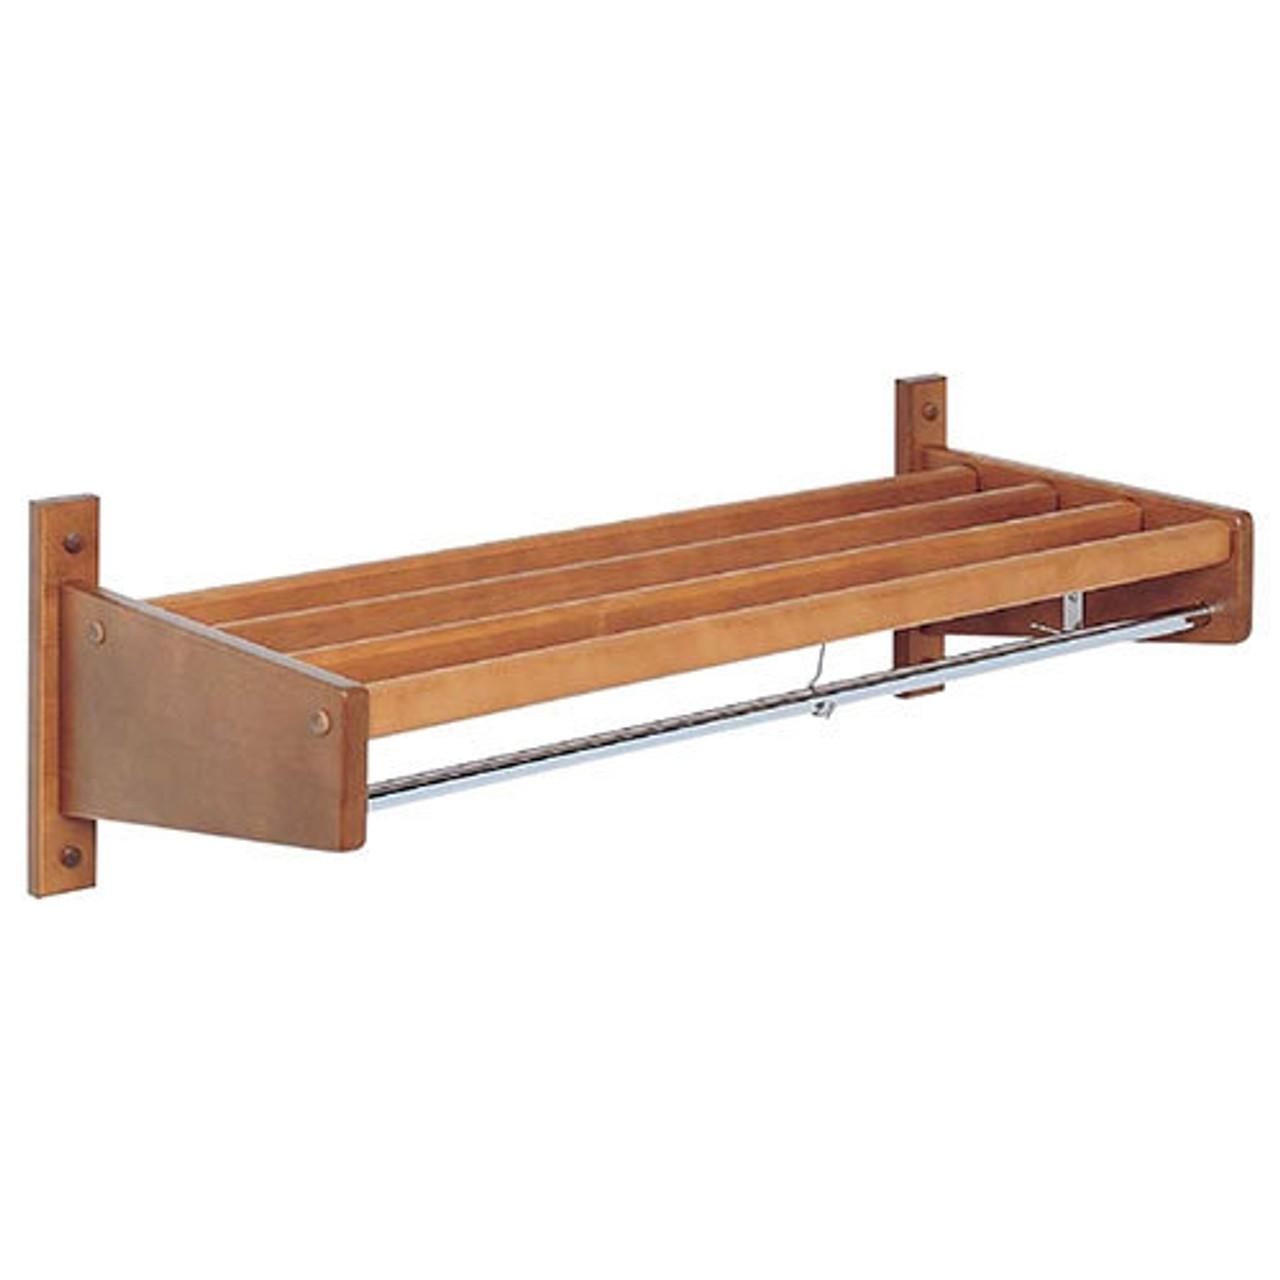 Wooden Coat Racks - All Types